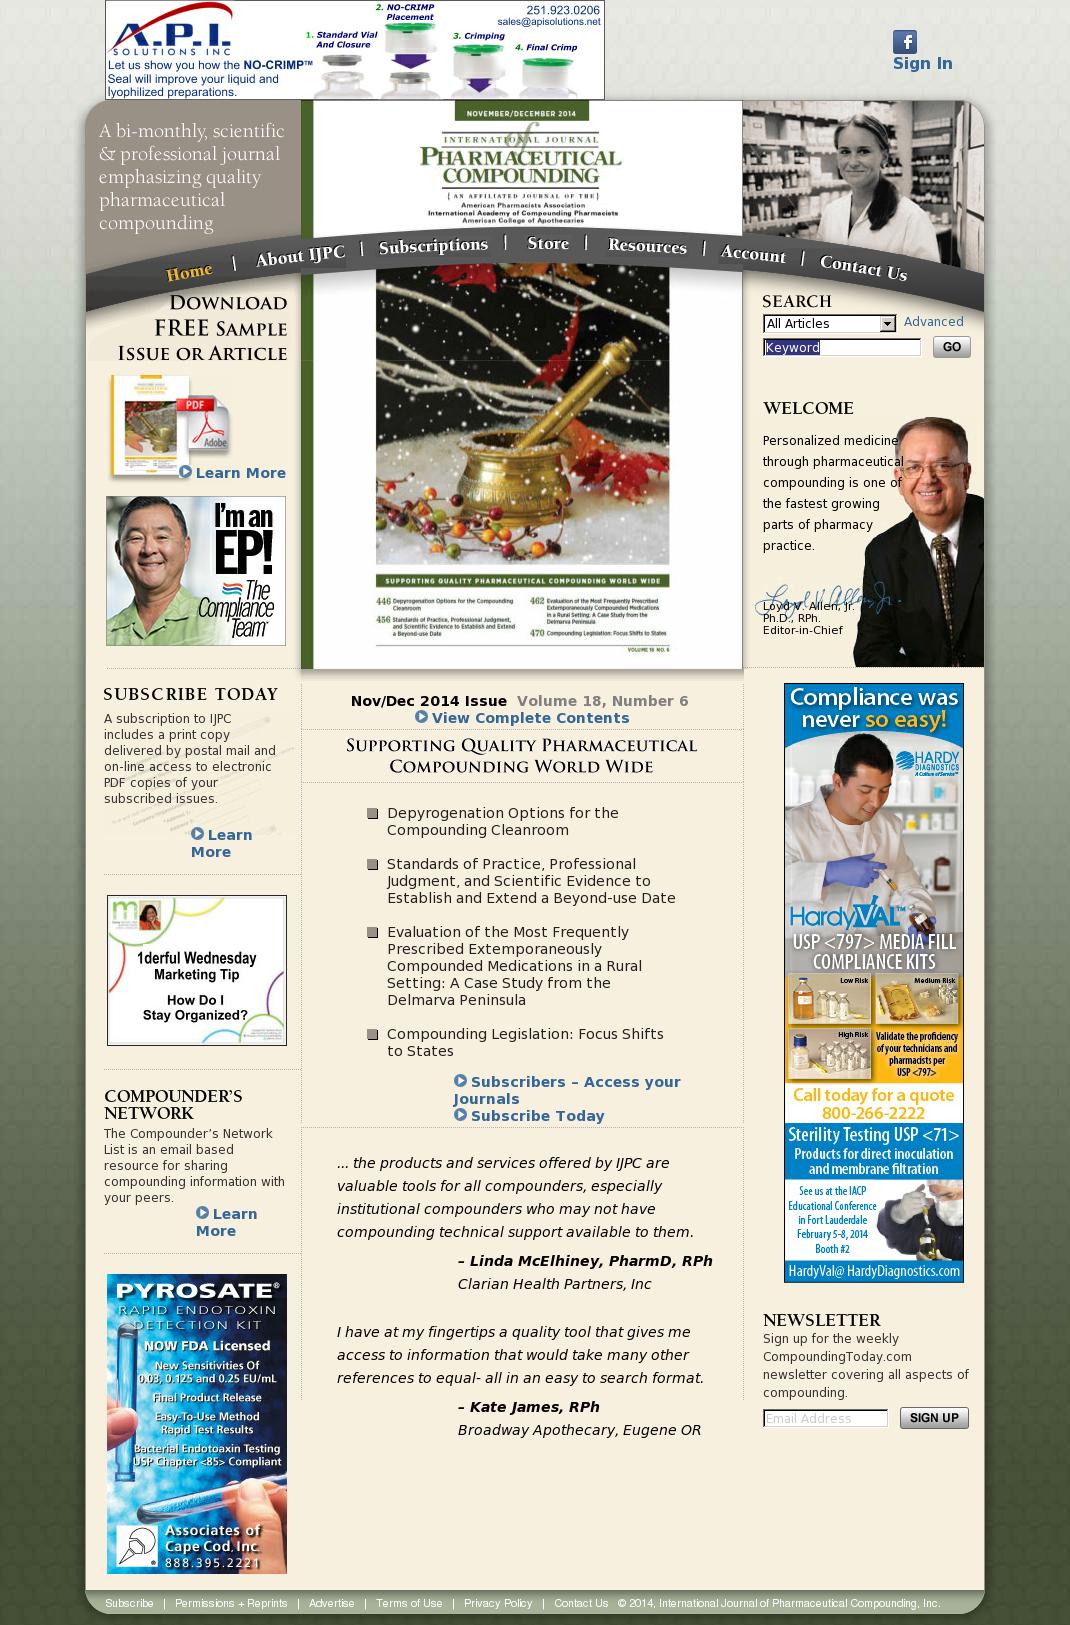 International Journal of Pharmaceutical Compounding